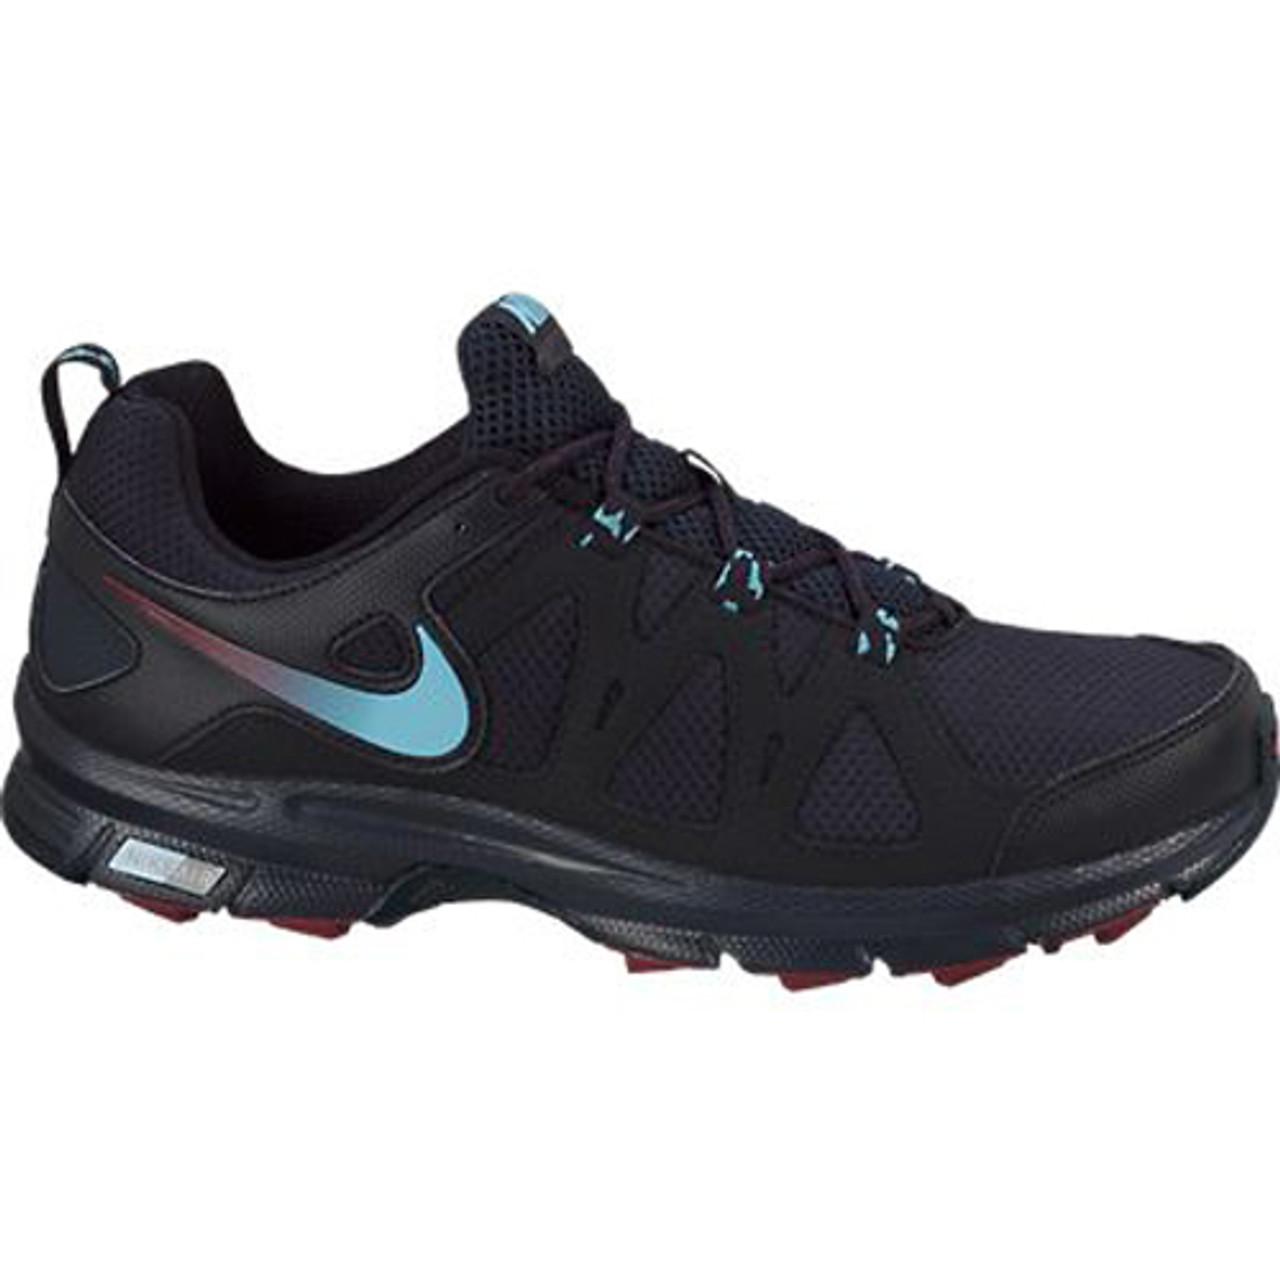 Nike Air Alvord 10 Obsidian/Navy Mens